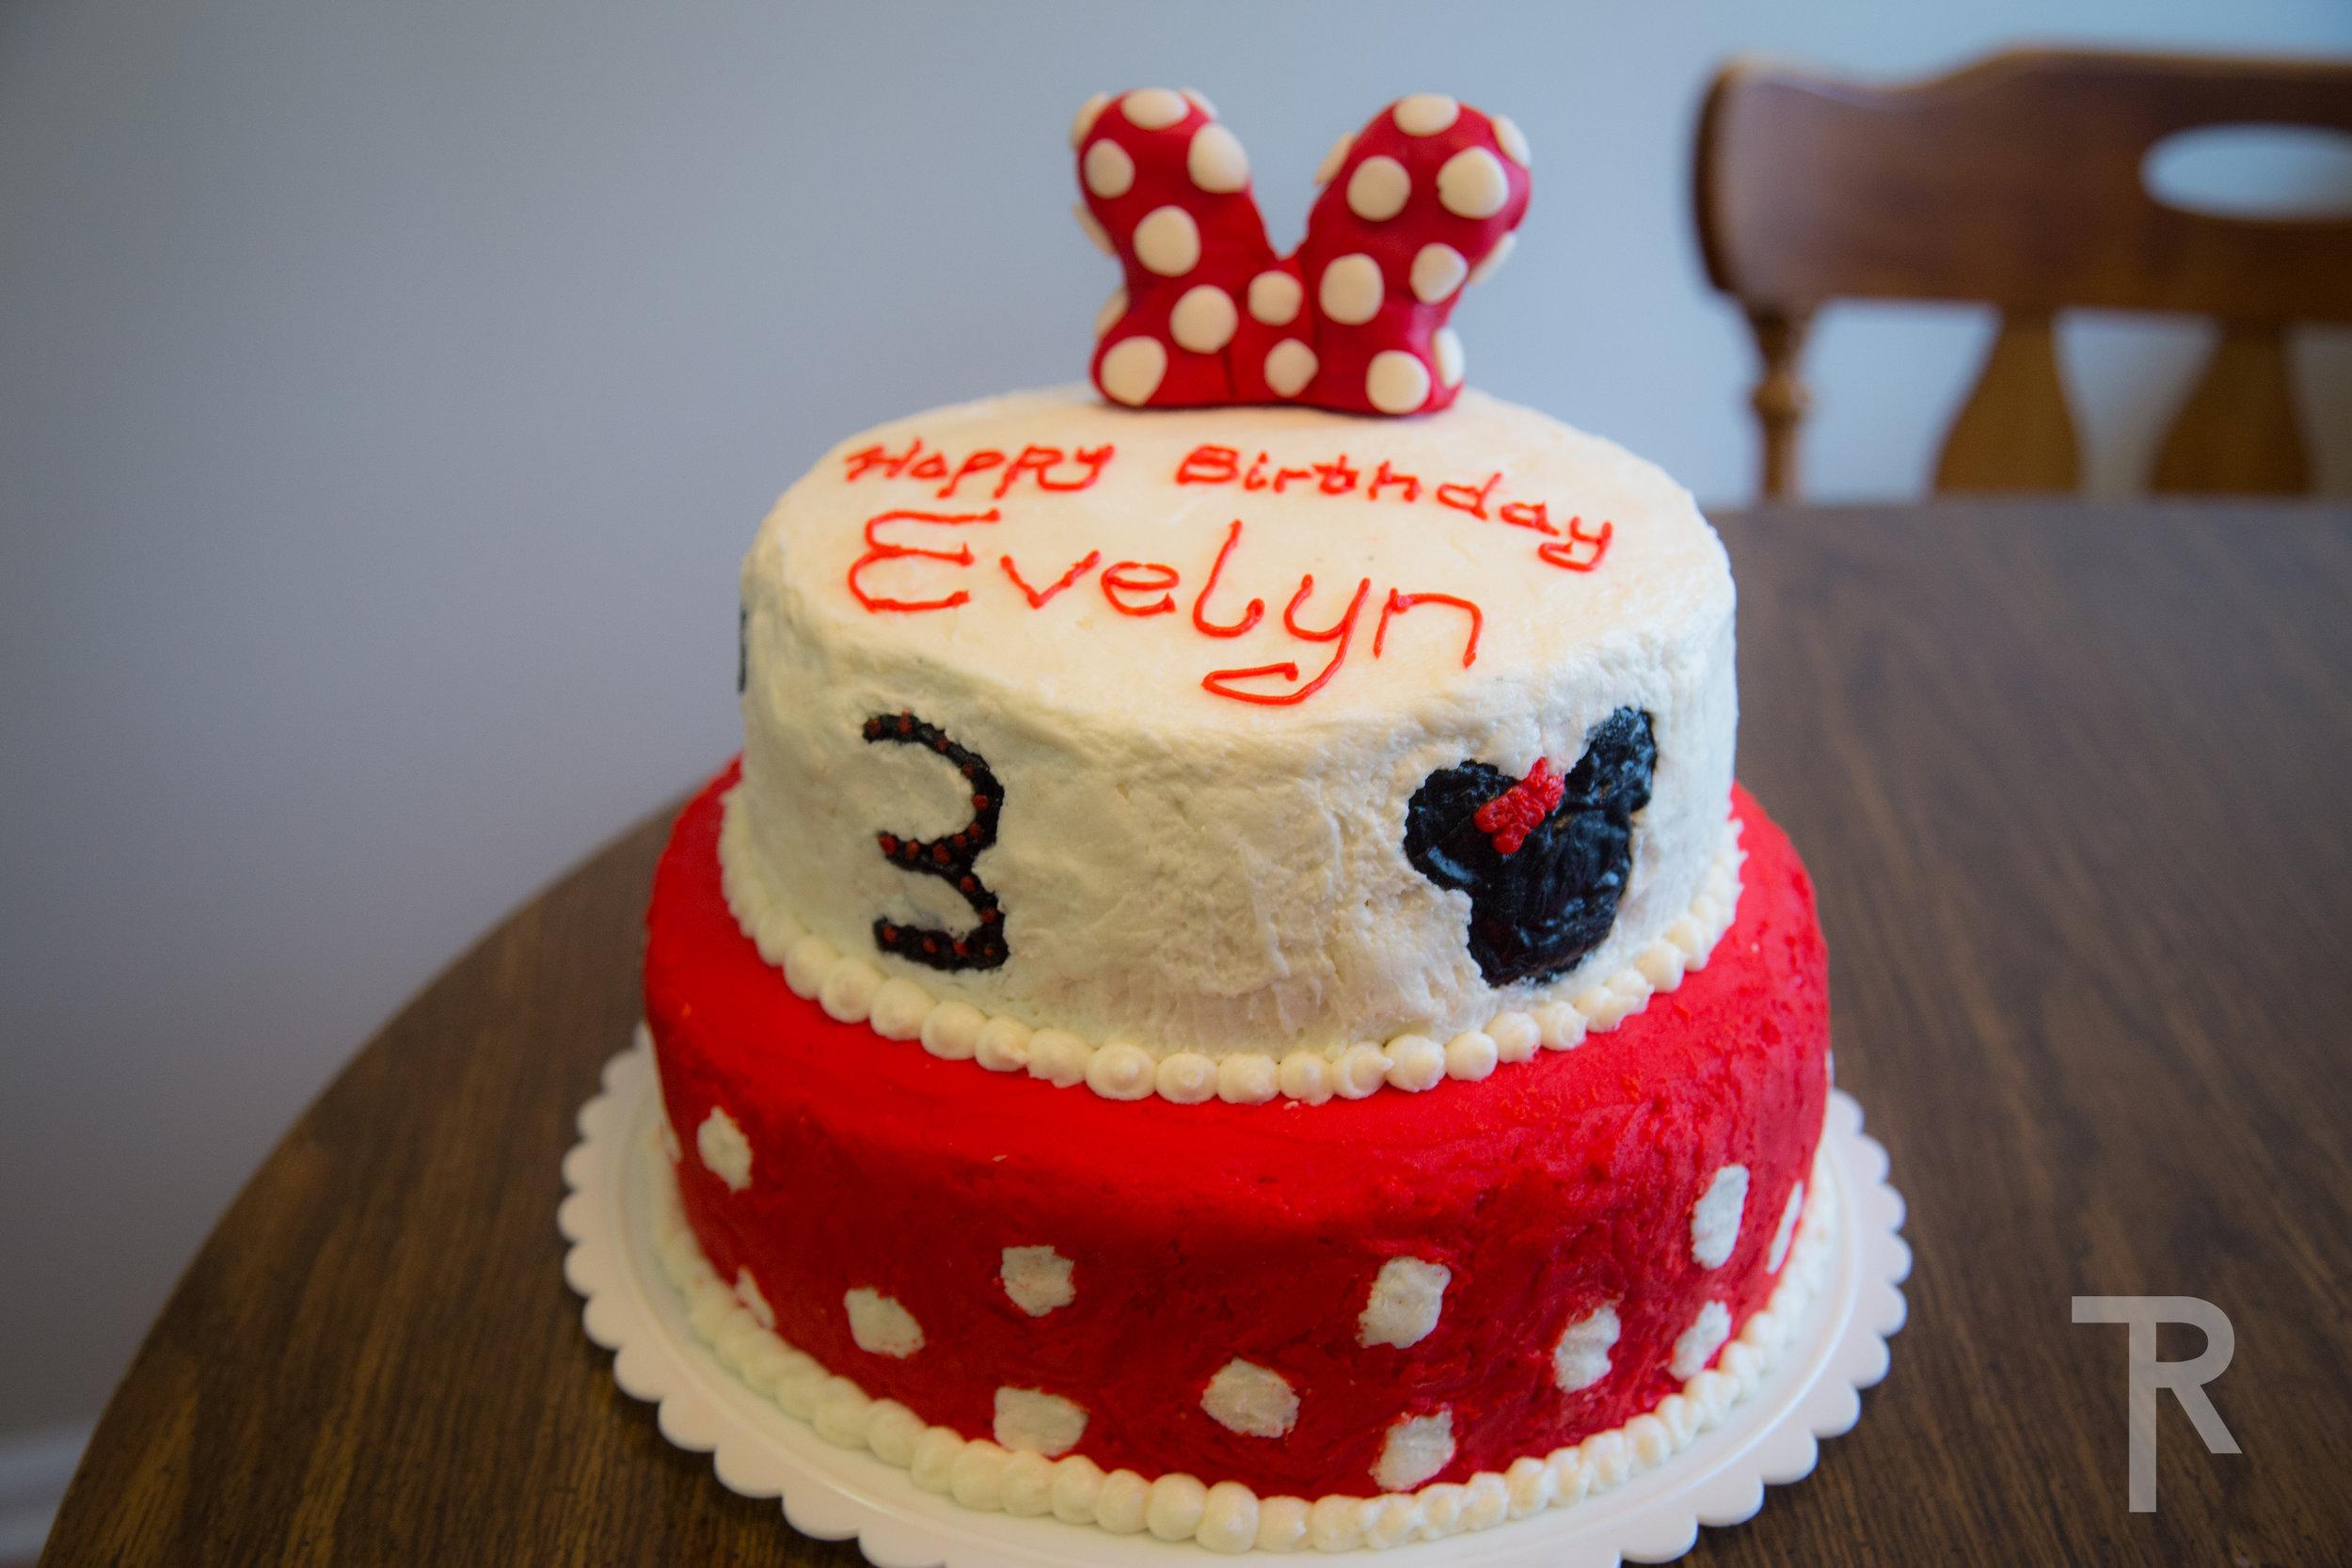 Cake-0623.jpg